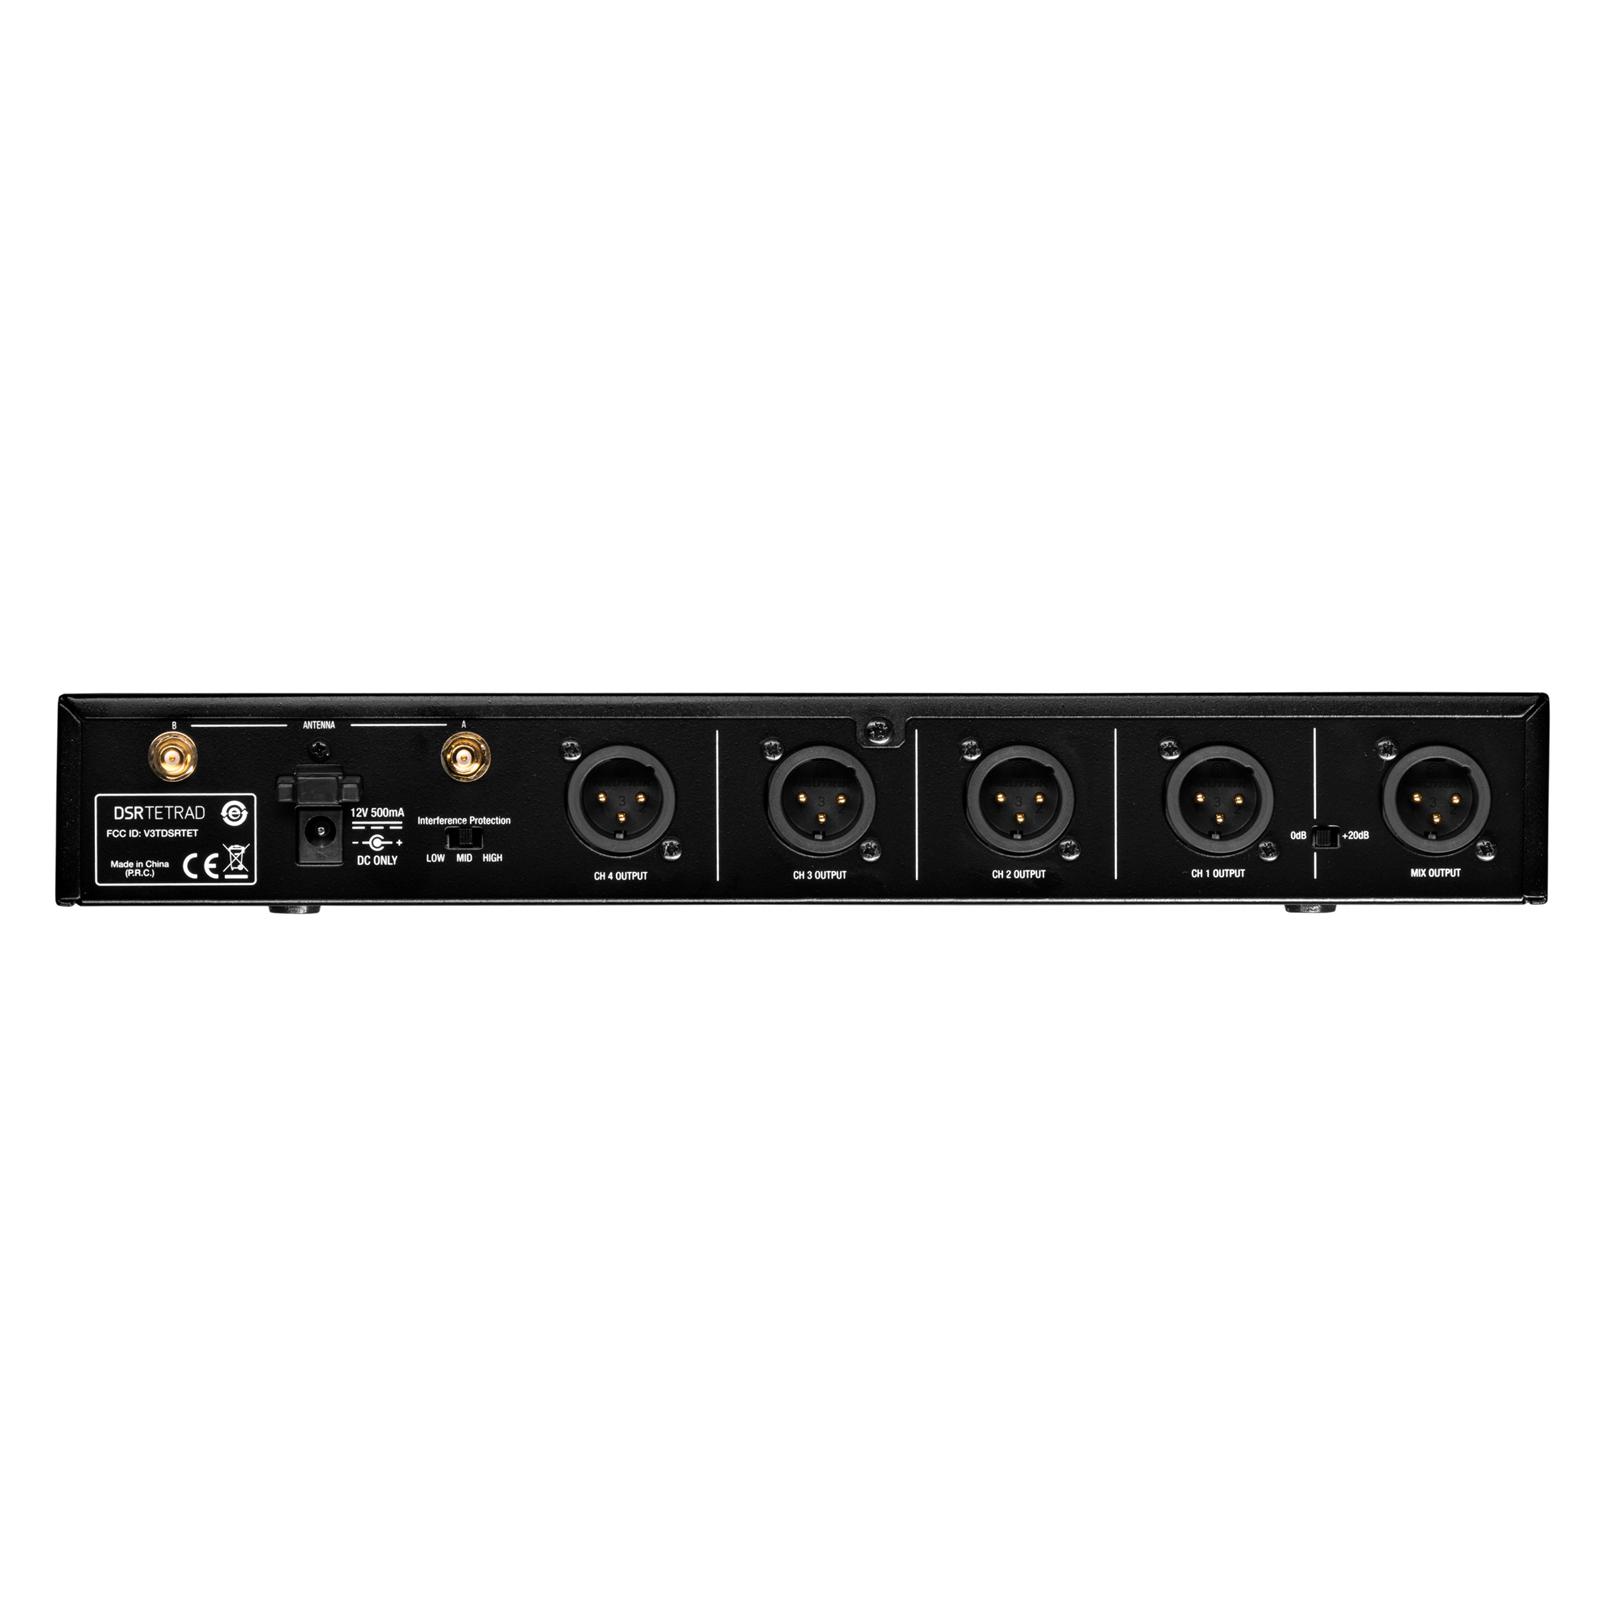 DSRTETRAD (EU) - Black - Reference digital wireless multichannel receiver - Back